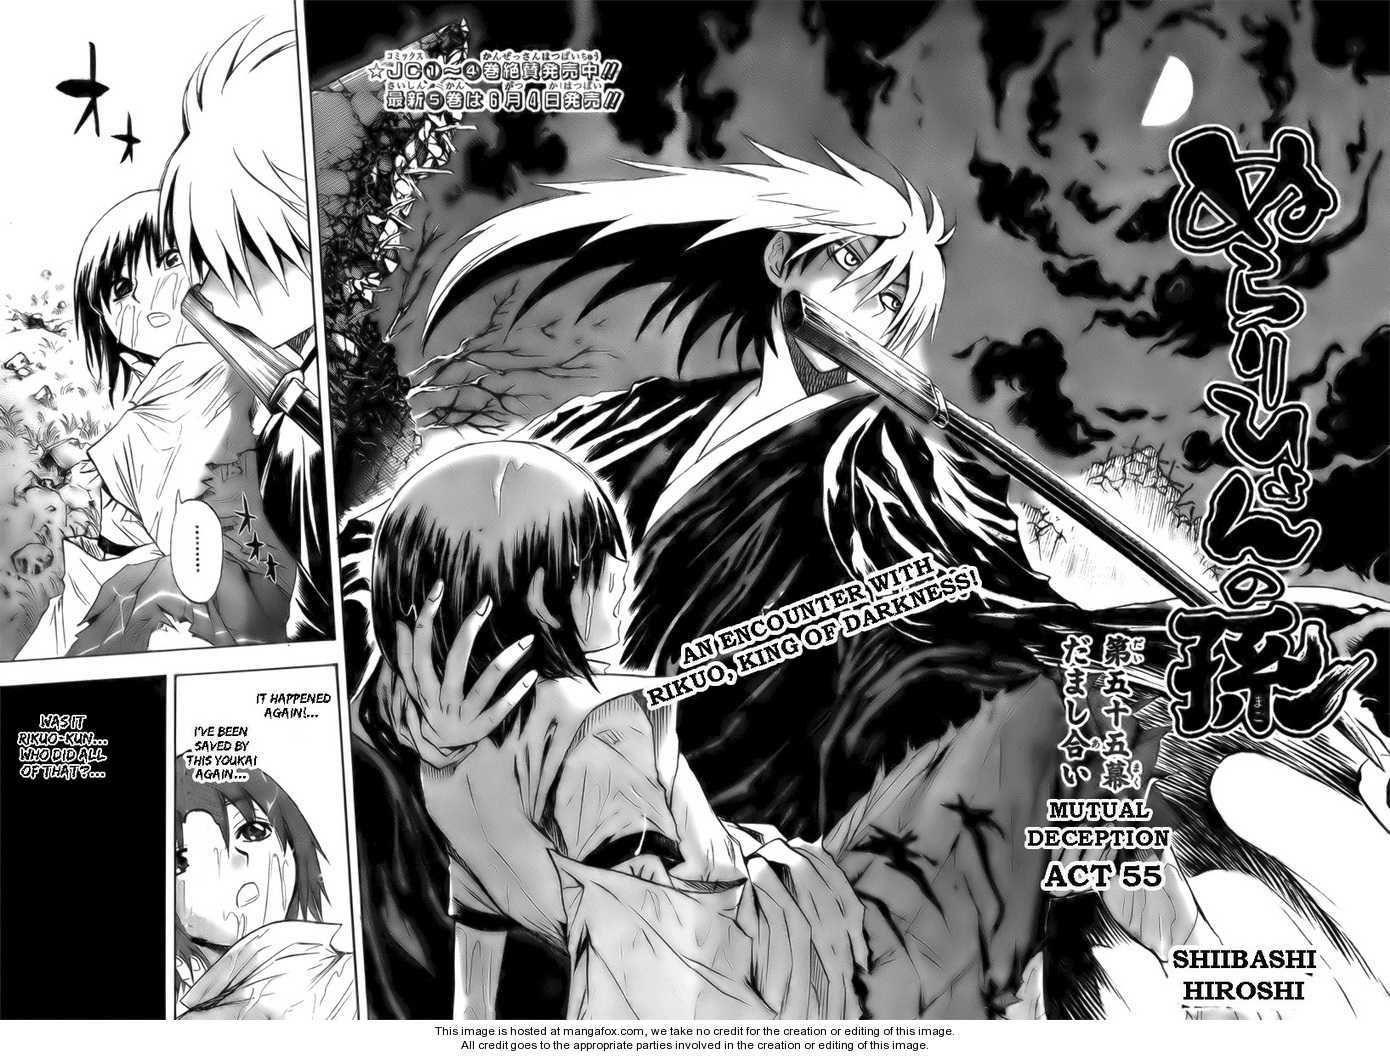 Nurarihyon No Mago 55: Mutual Deception At MangaFox.me